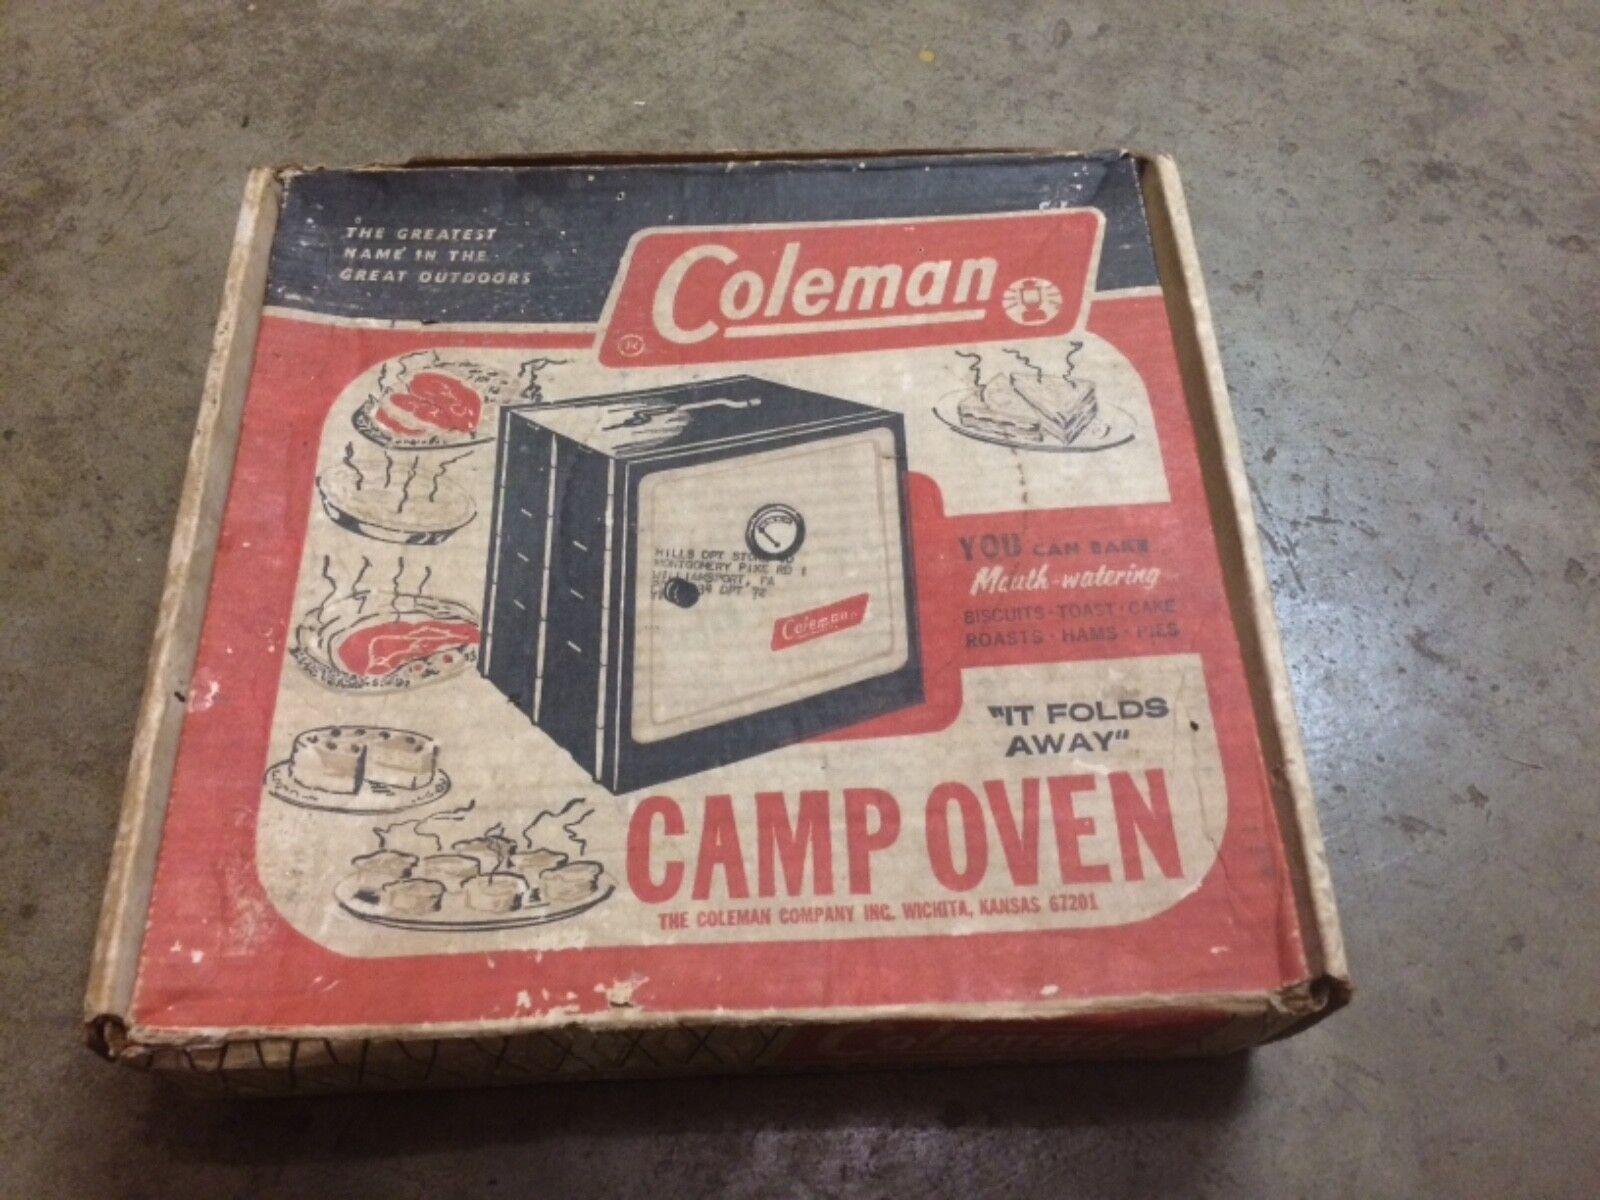 Vintage Coleman Folding Camp Oven Model No  5010A700 Original Box Clean  factory outlet store